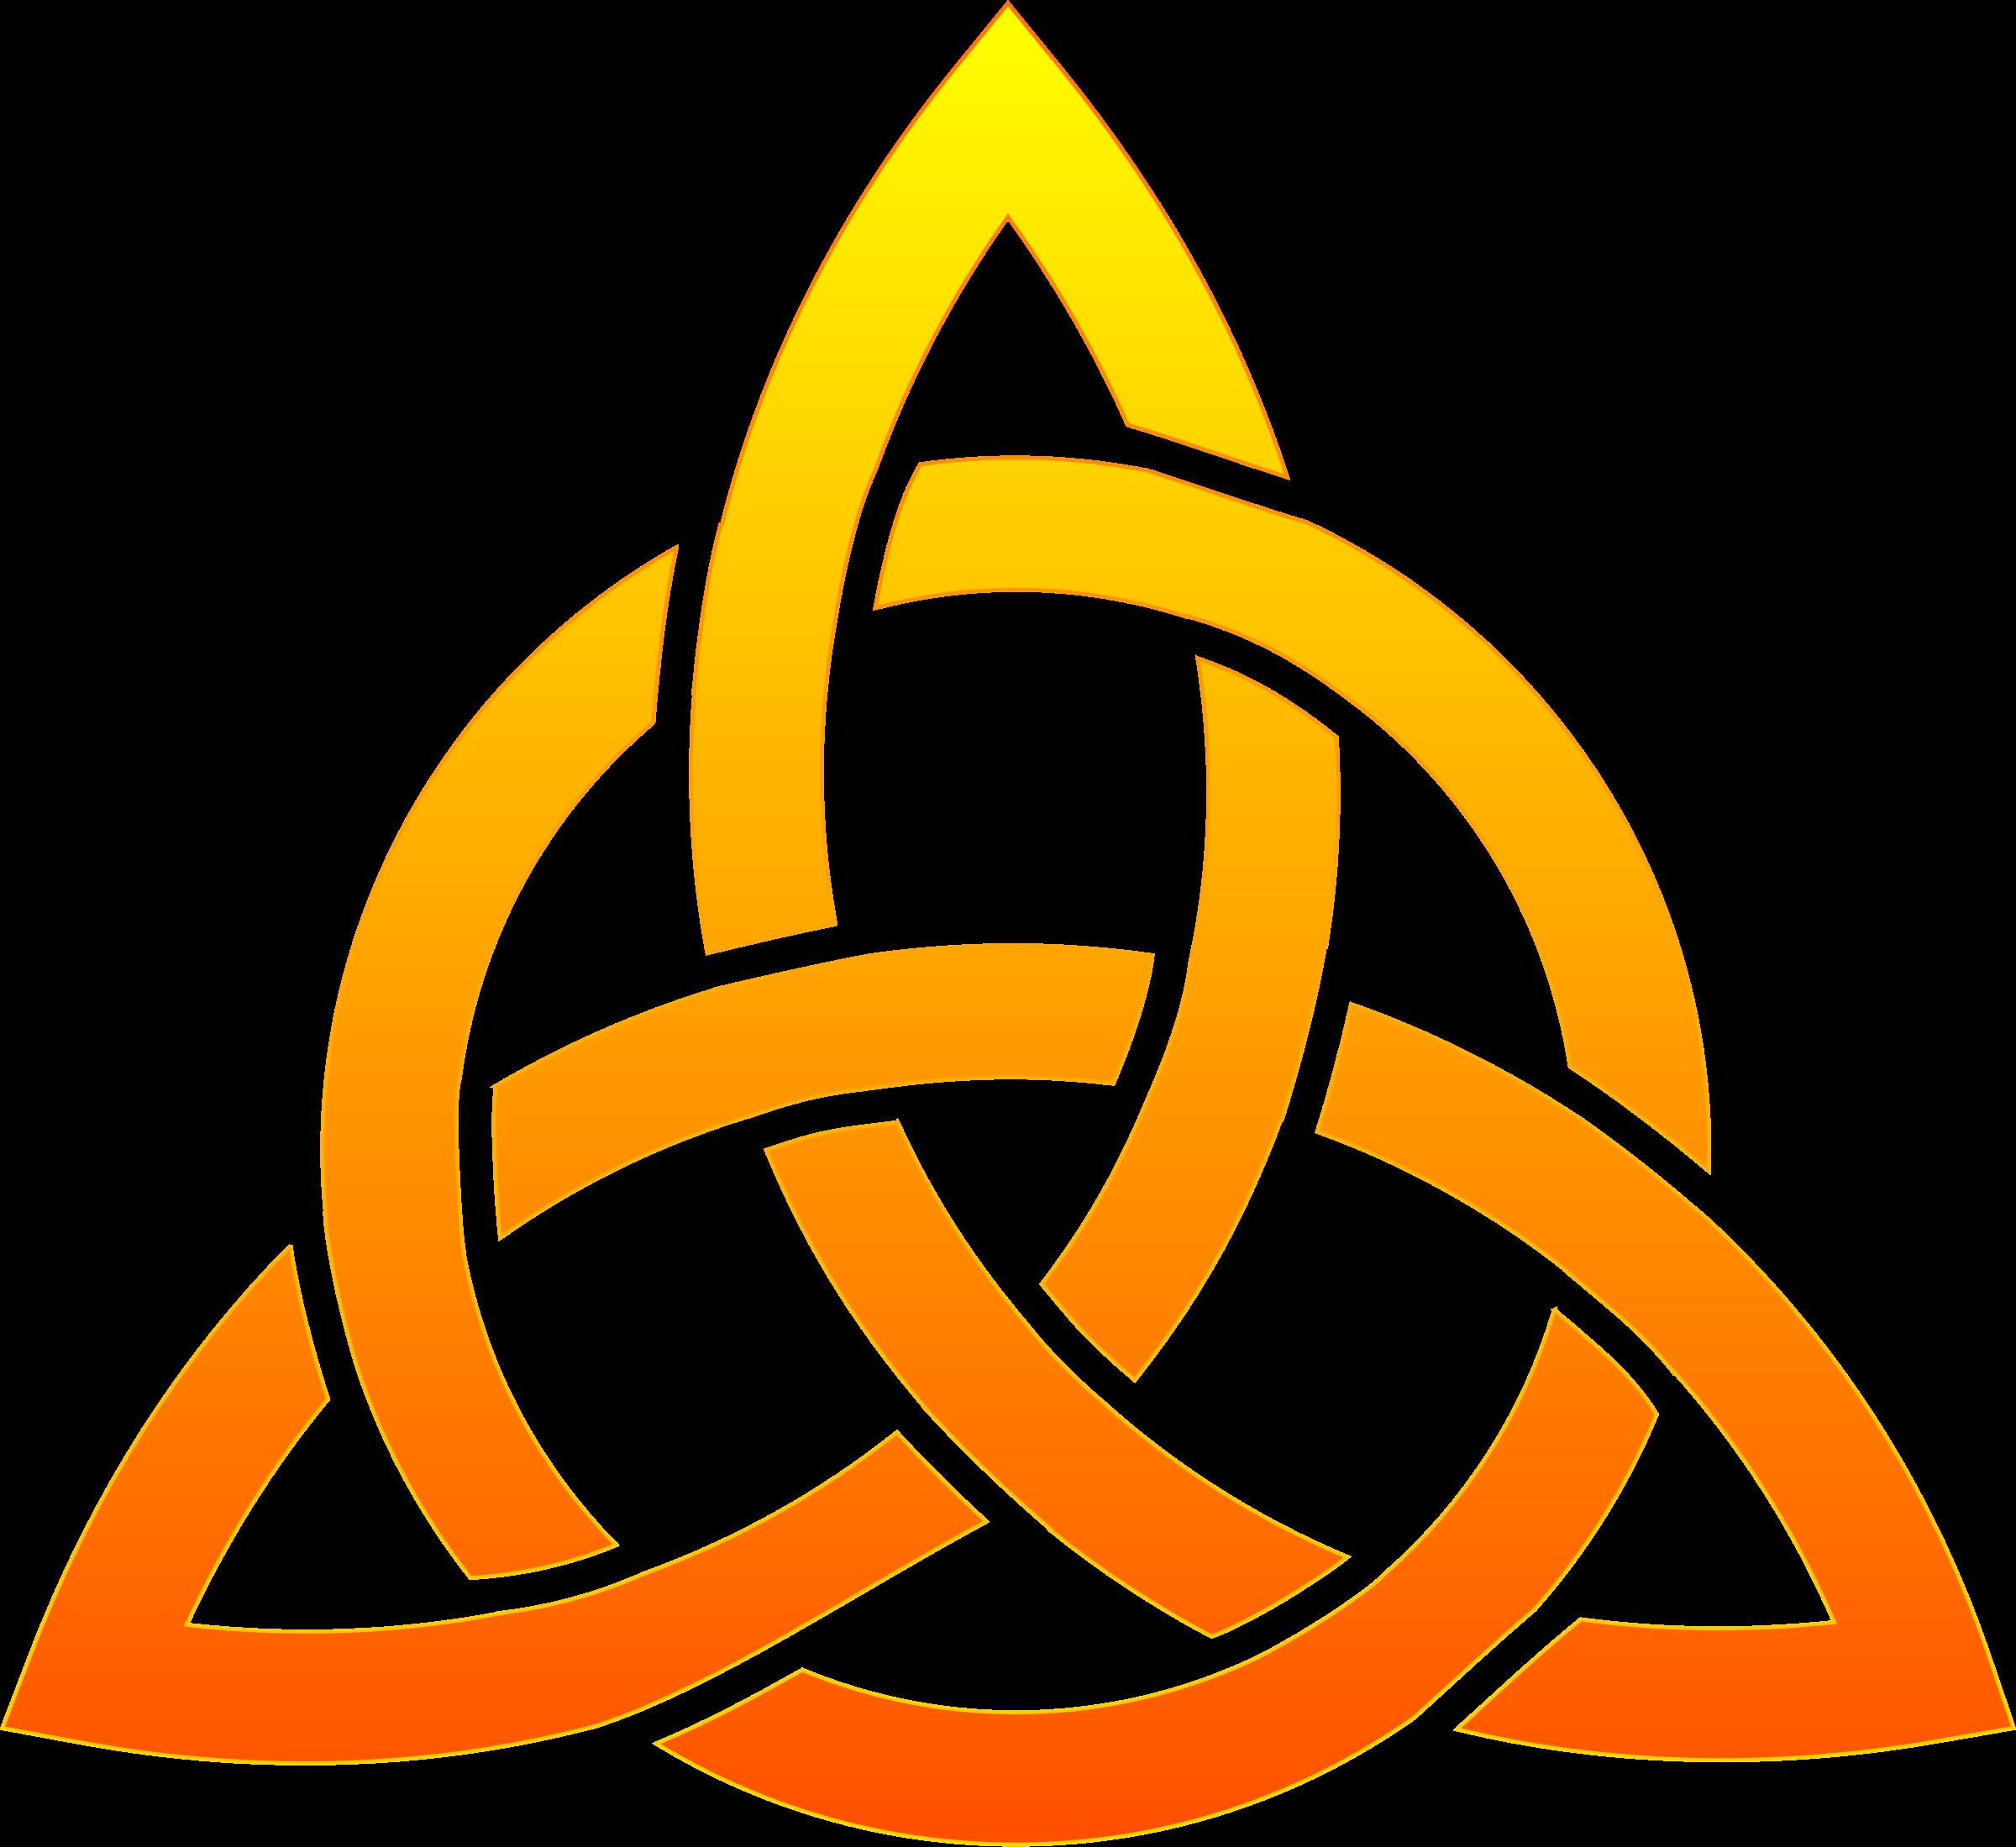 Celt clipart trinity knot Trinity knot trinity knot Celtic